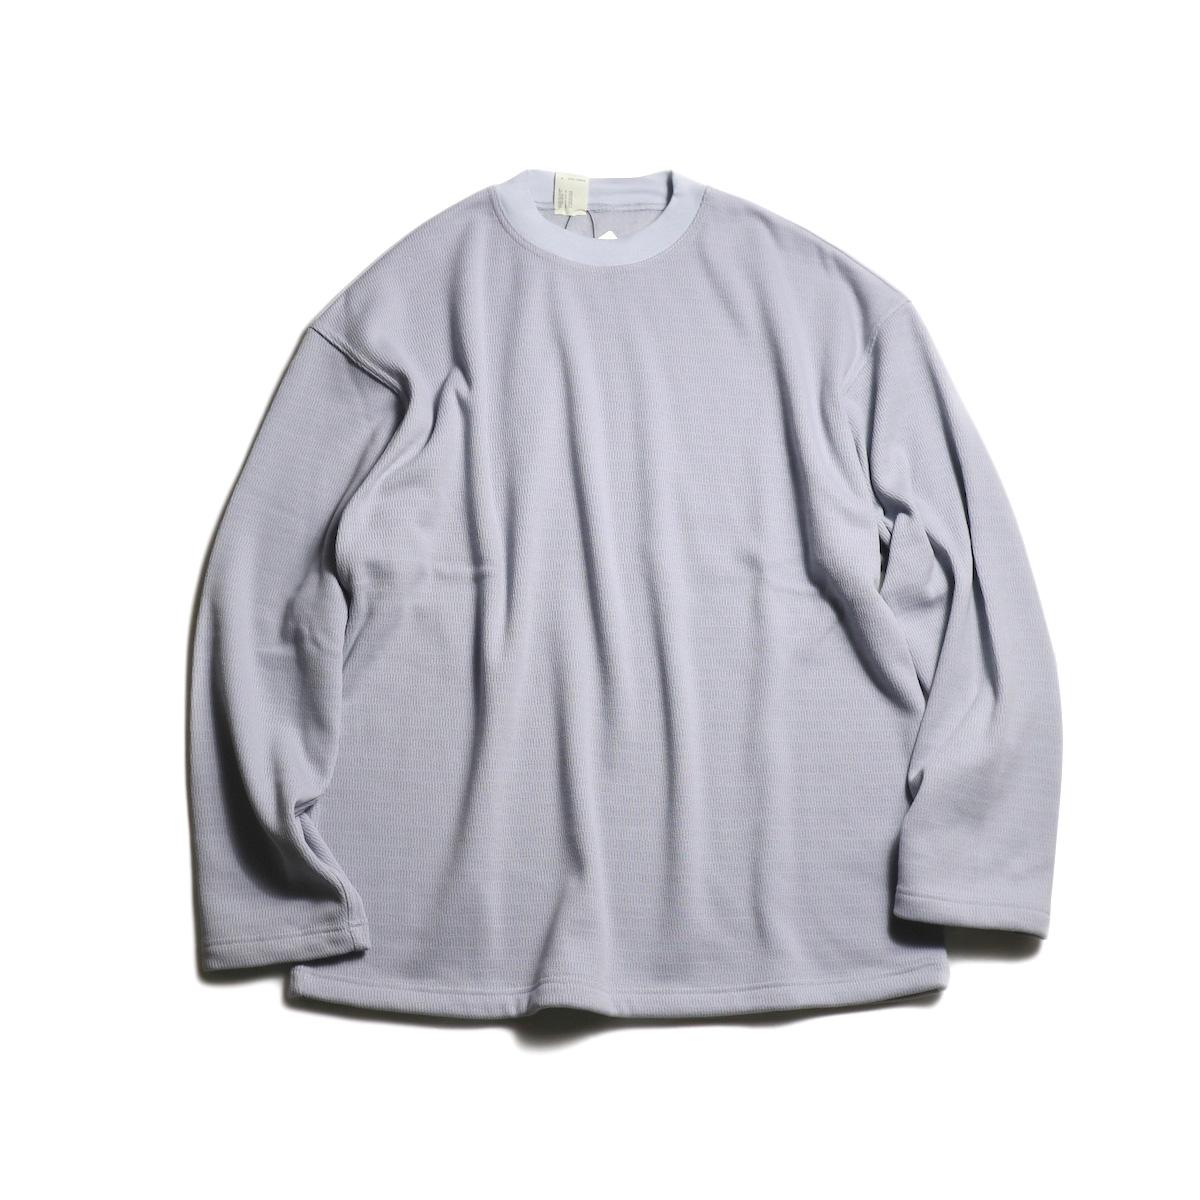 N.HOOLYWOOD / 192-CS14-033 Thermal L/S Tee (Gray)